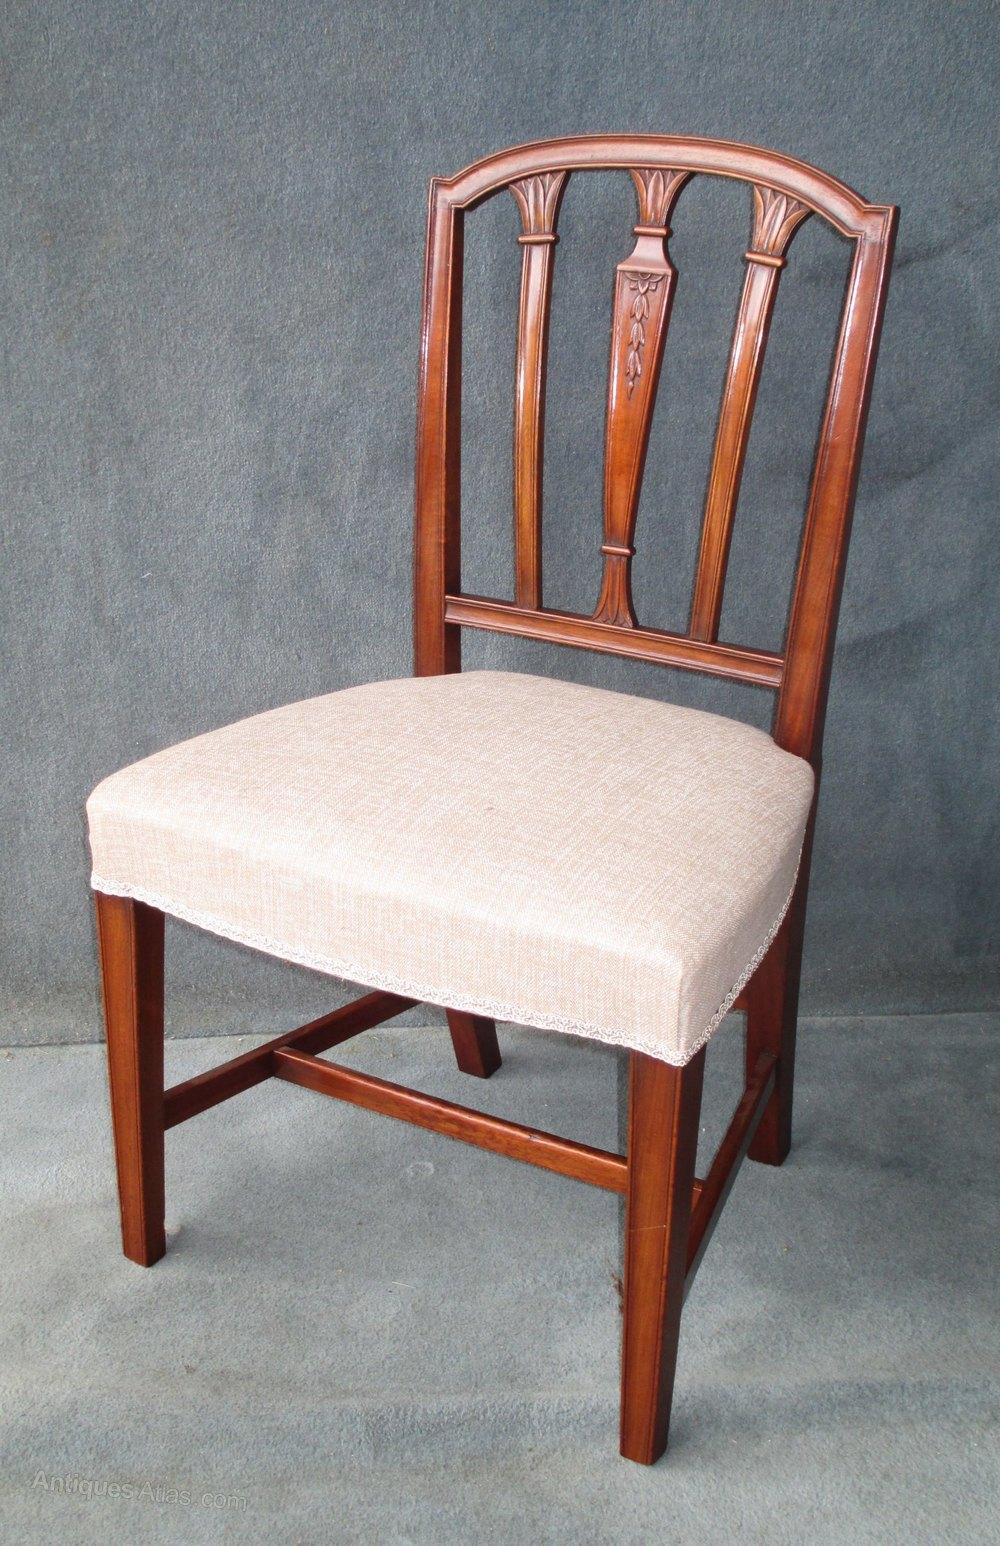 A Set Of 6 + 2 Mahogany Sheraton Style Chairs - Antiques Atlas